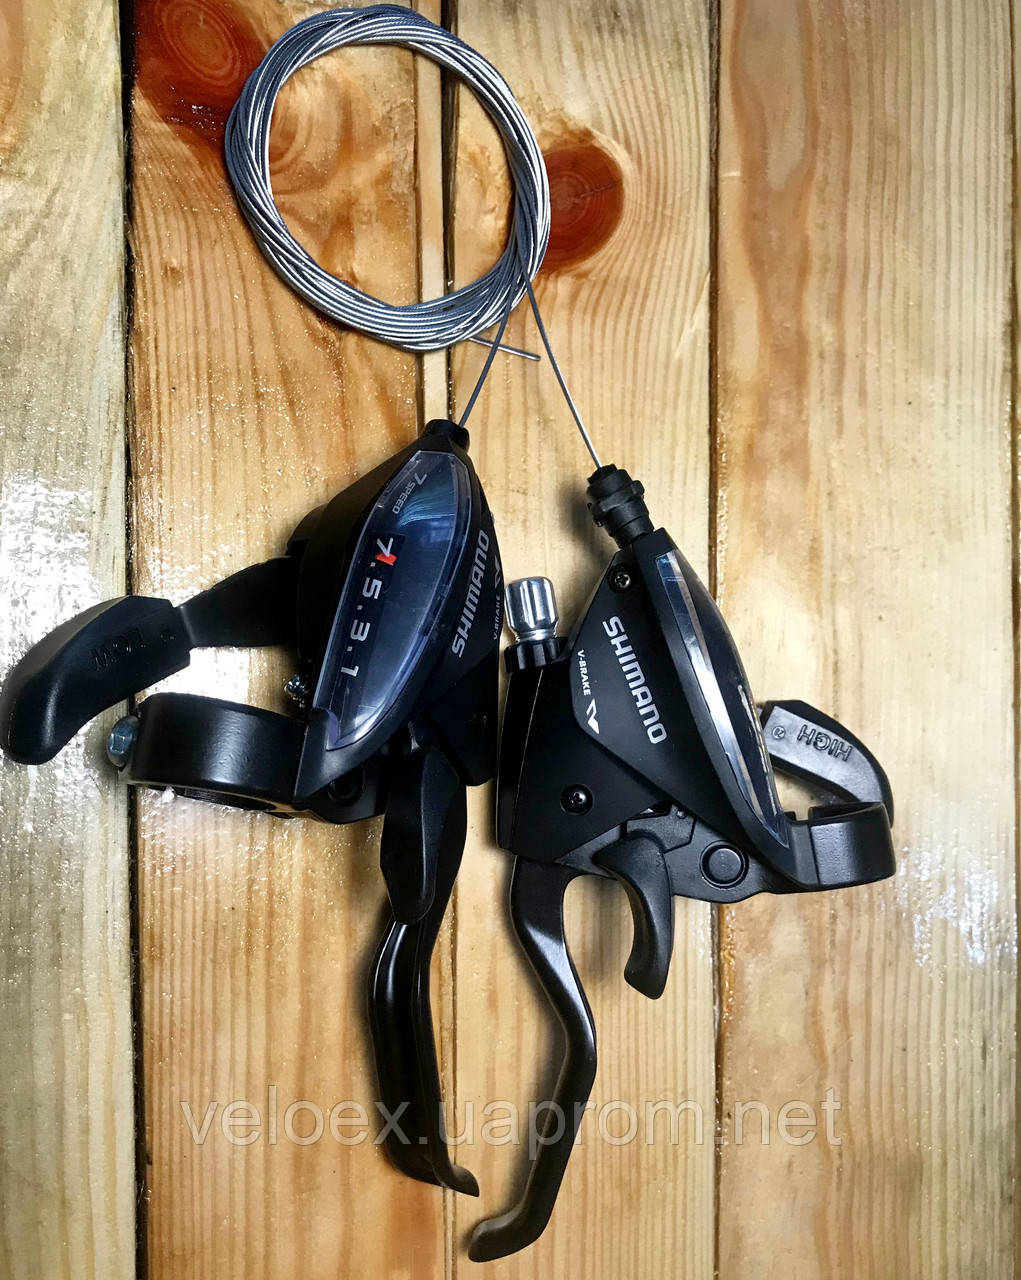 Тормозная ручка / манетка Shimano Tourney ST-EF510 3x7